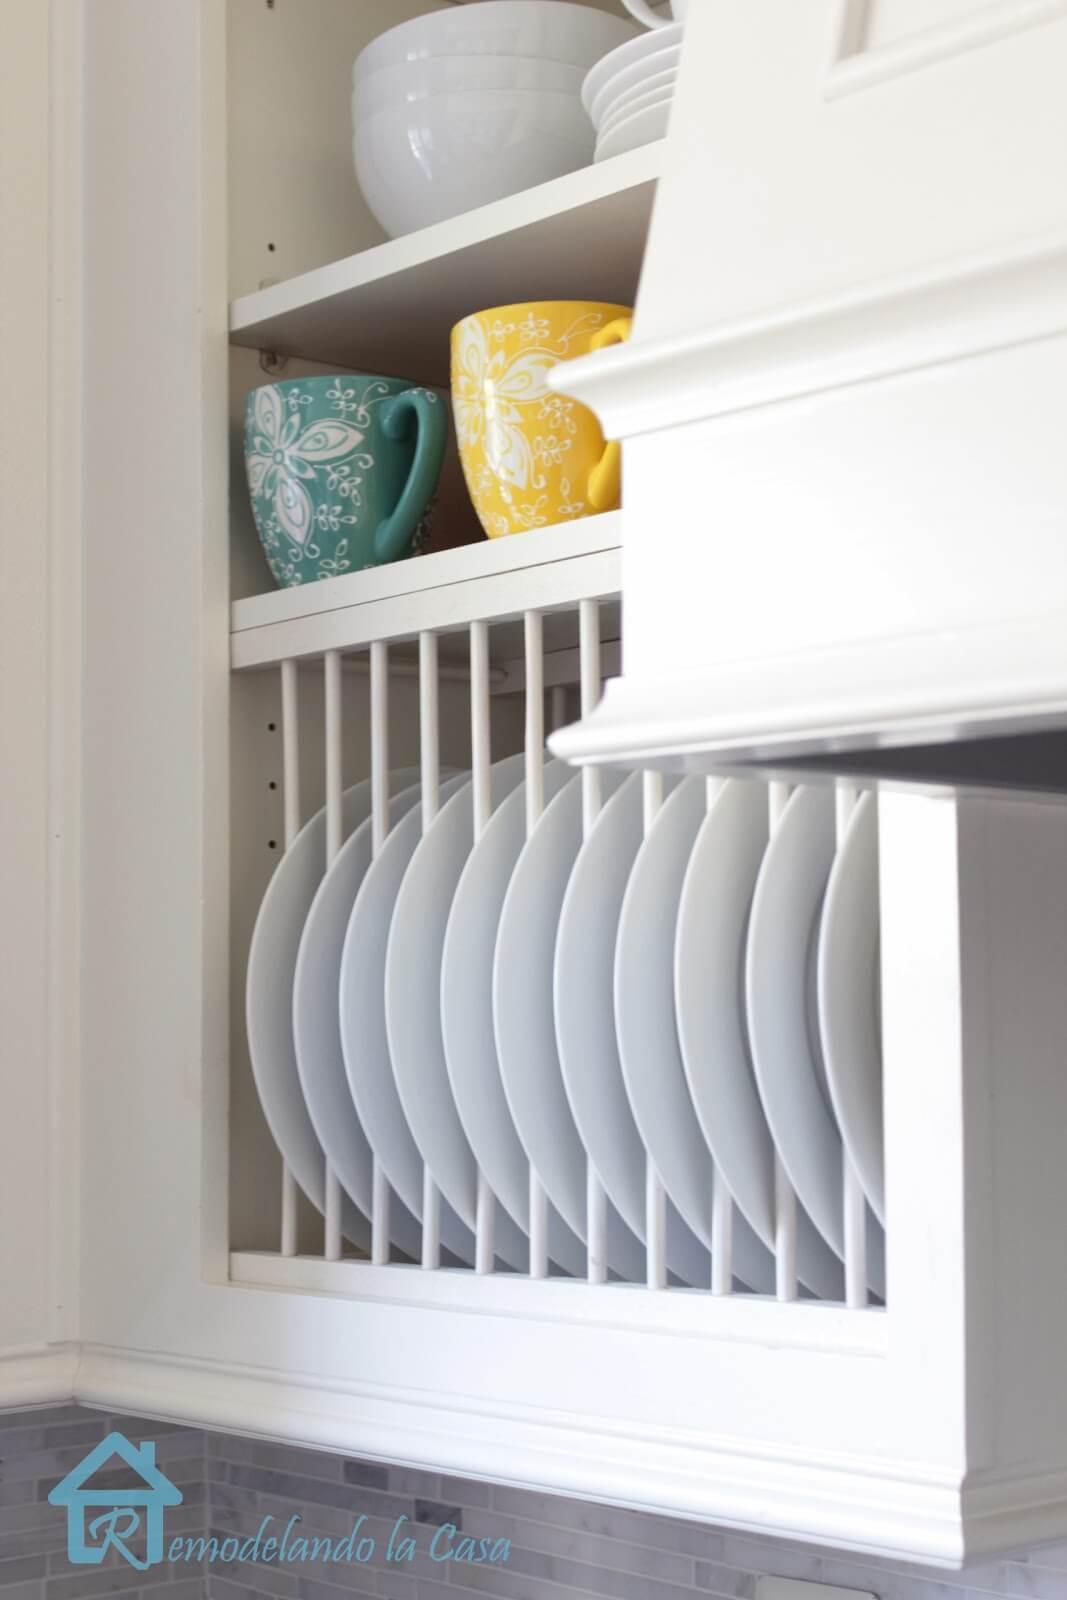 11. DIY Cabinet Plate Rack